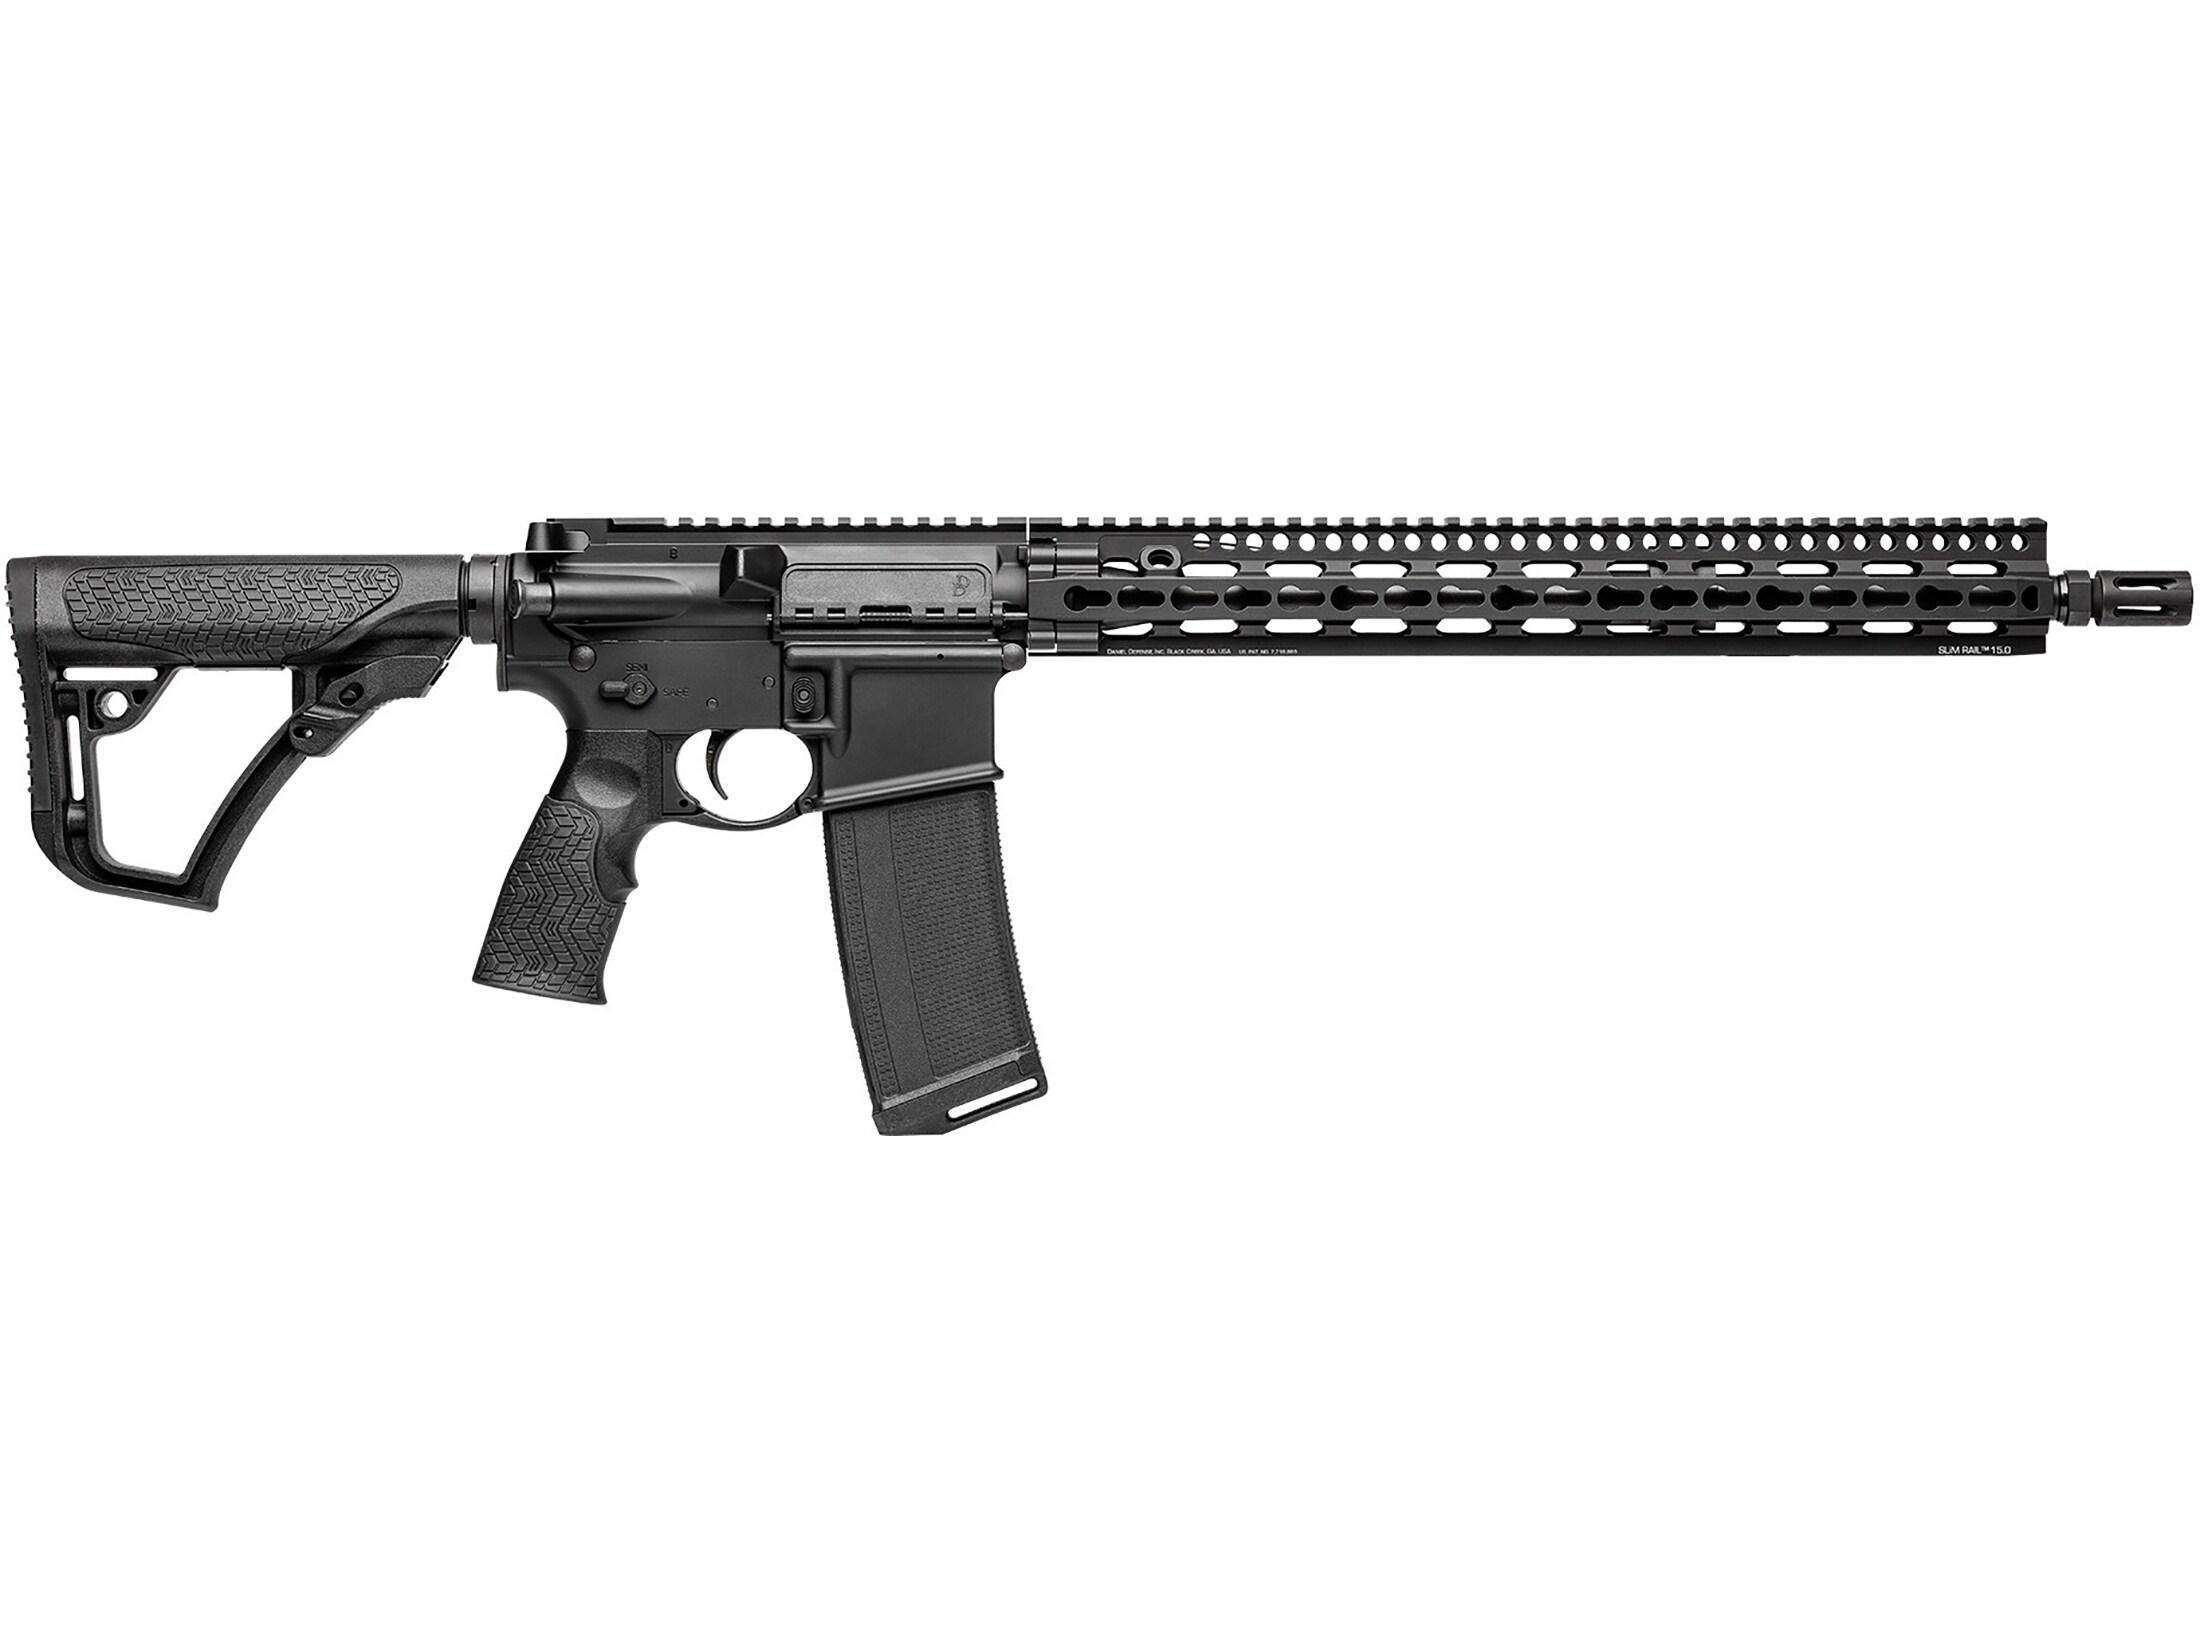 "Image of Daniel Defense DDM4v11 Carbine 16"" Barrel 32-Round KeyMod Polymer"